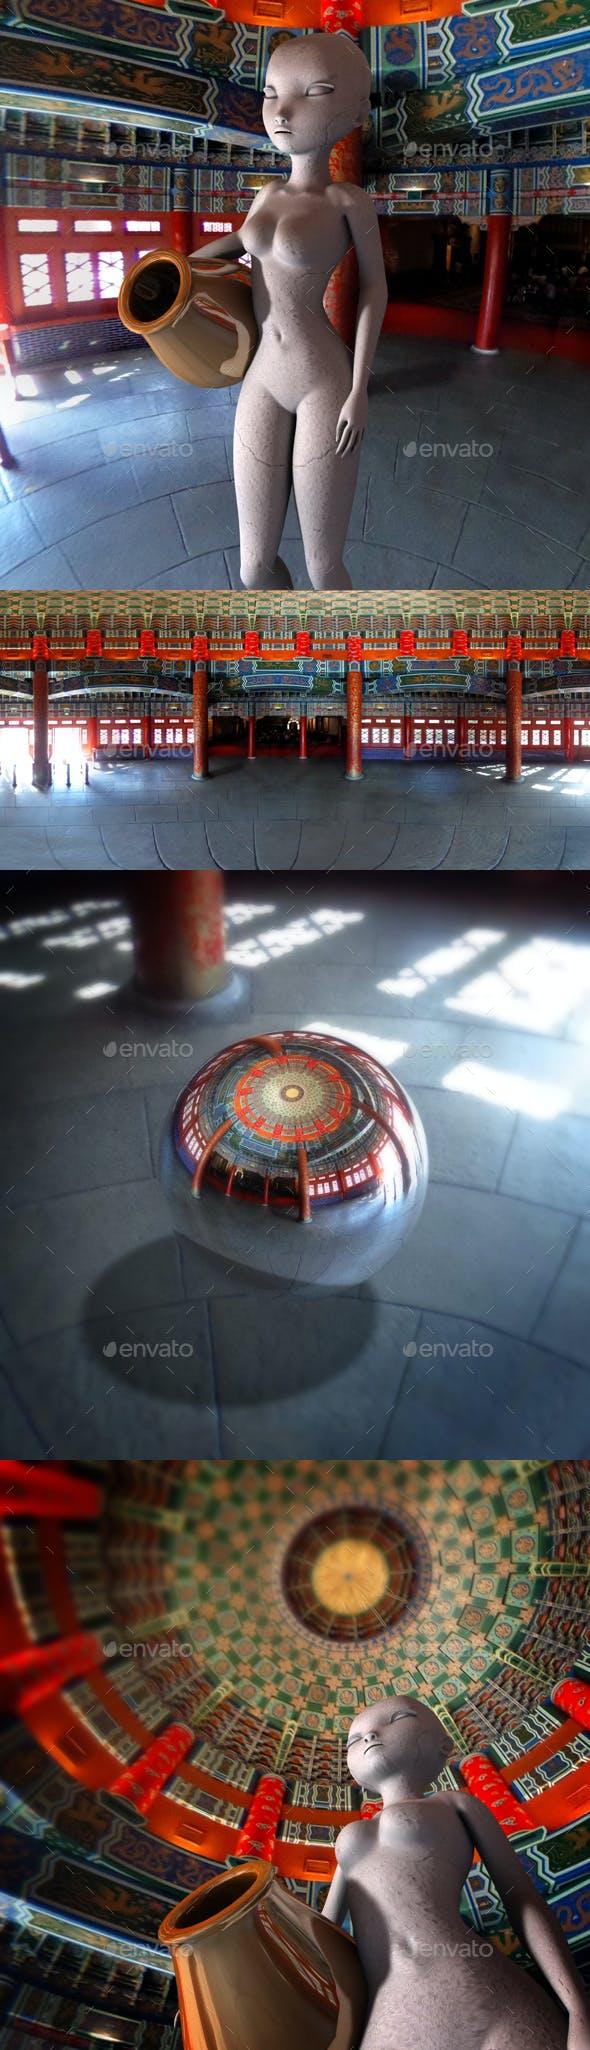 Chinese Temple Interior HDRI - 3DOcean Item for Sale